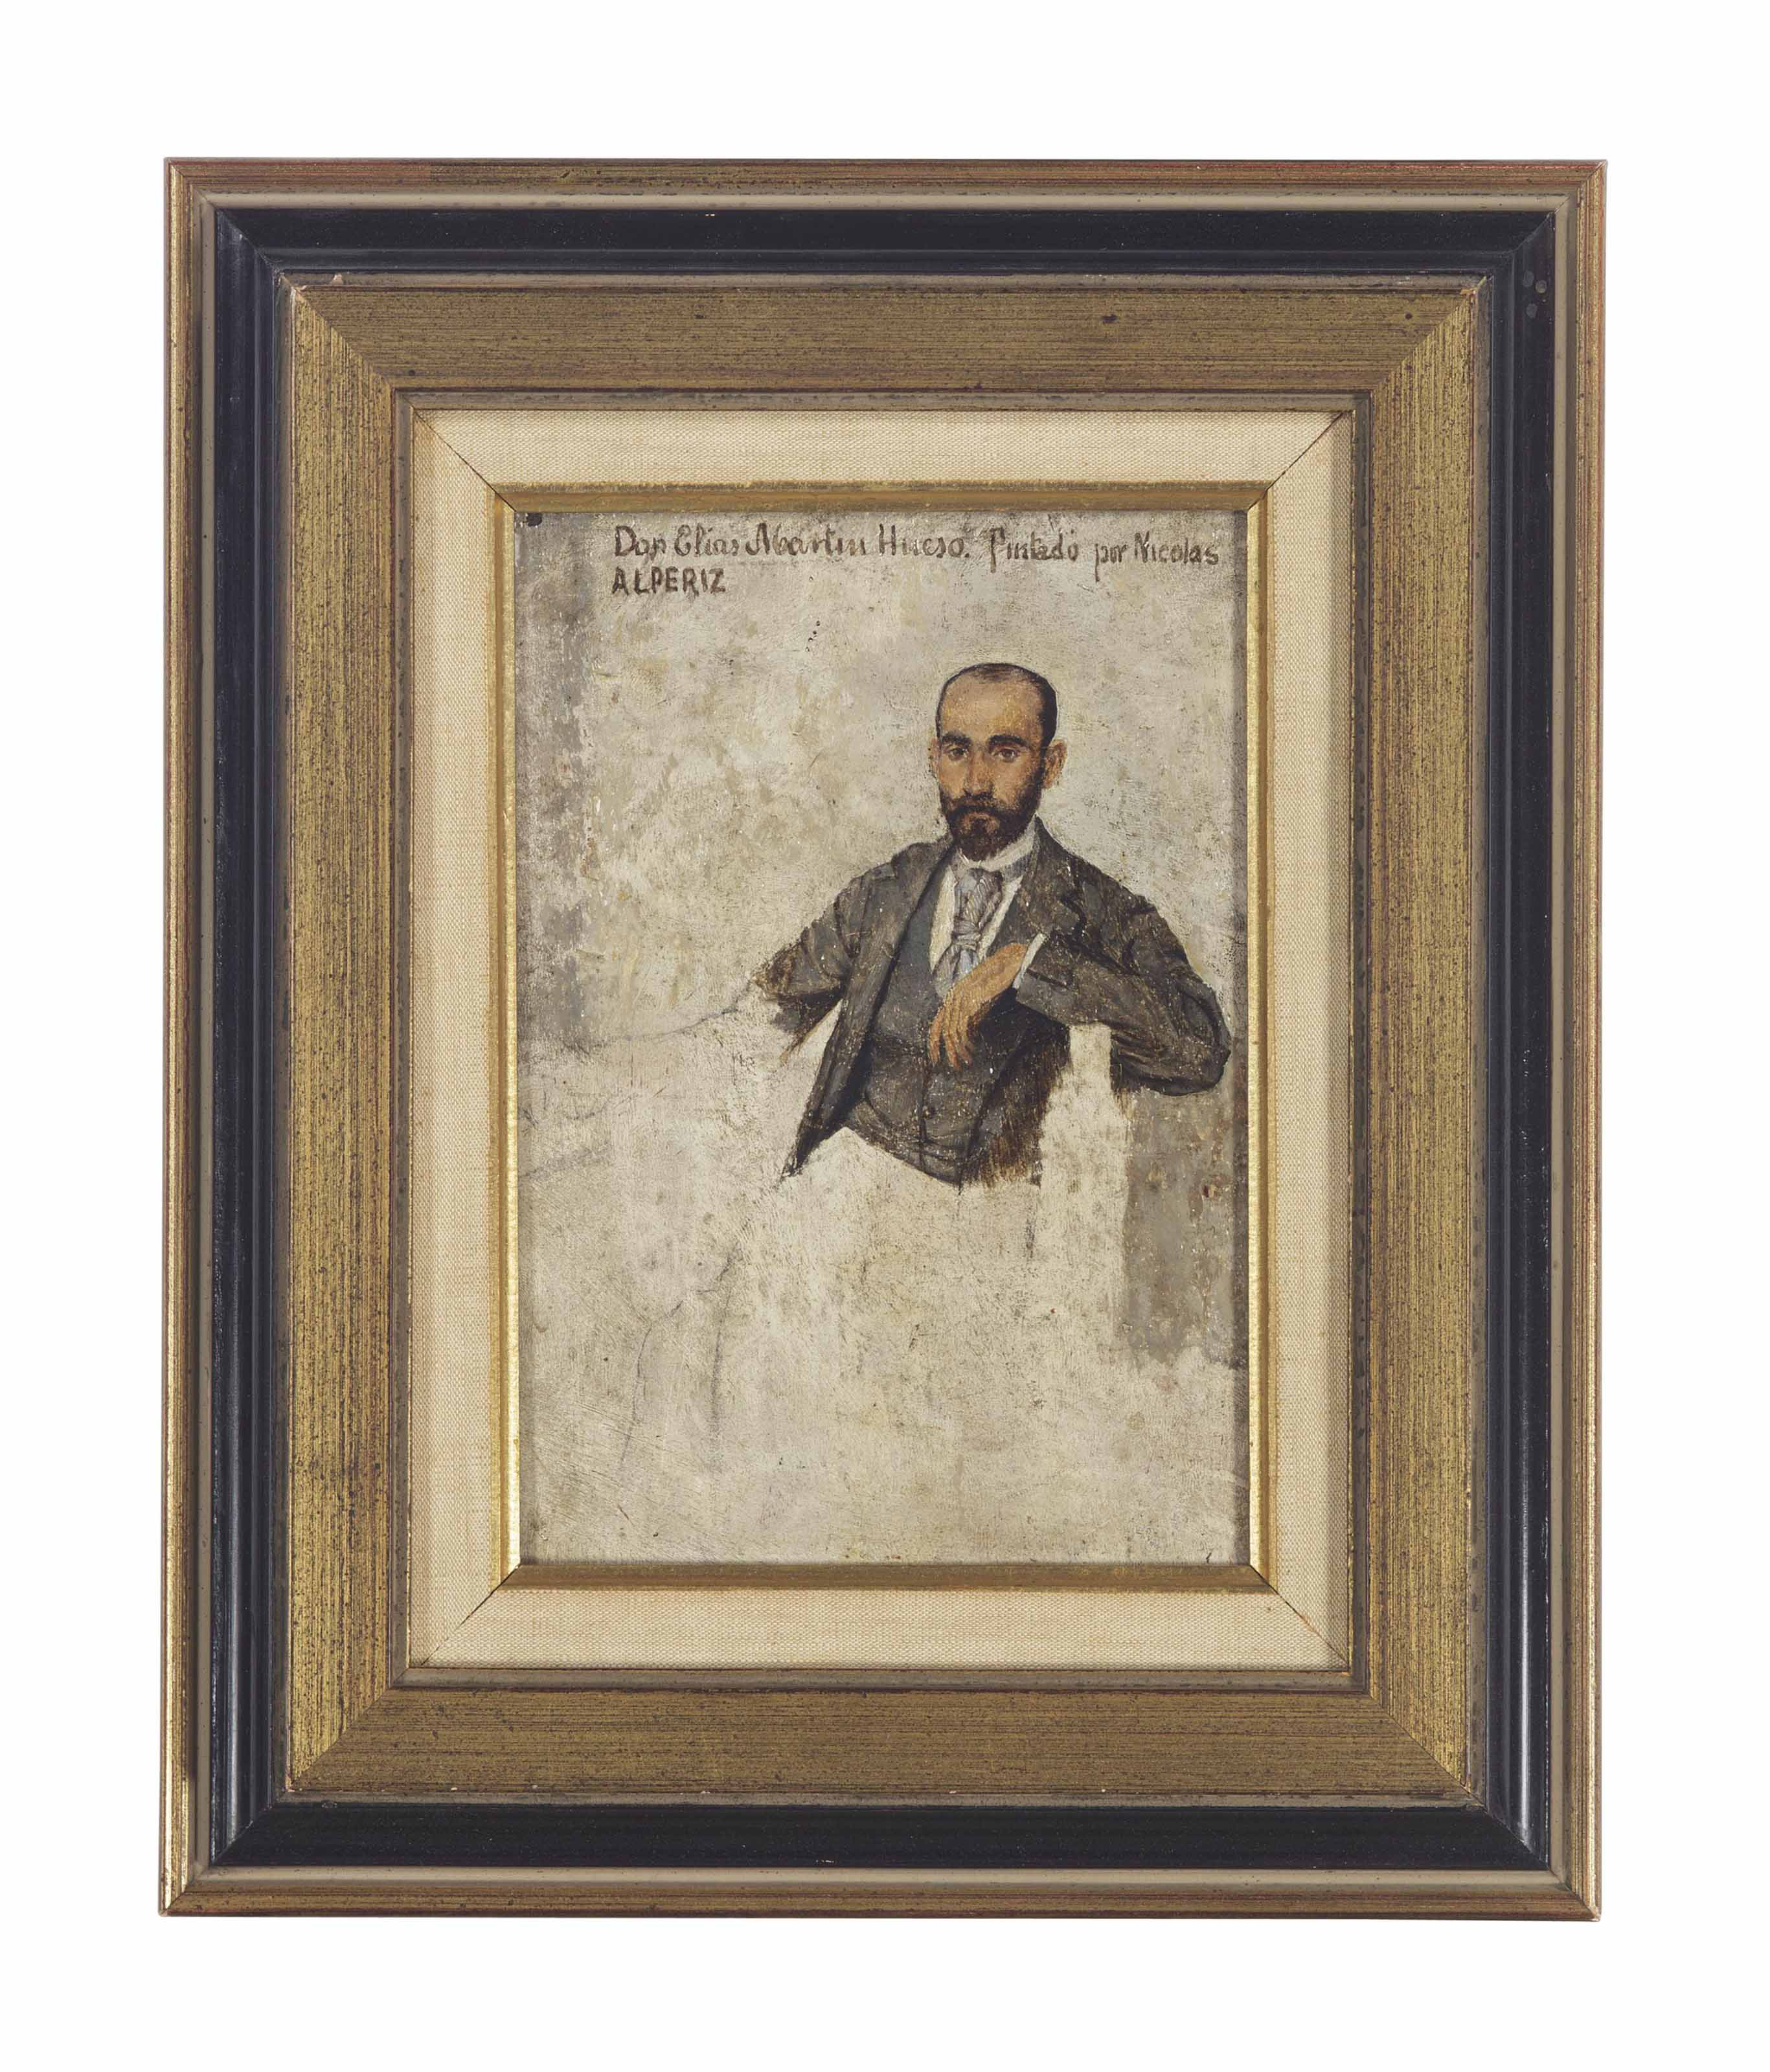 Portrait of Don Elias Martin Hueso